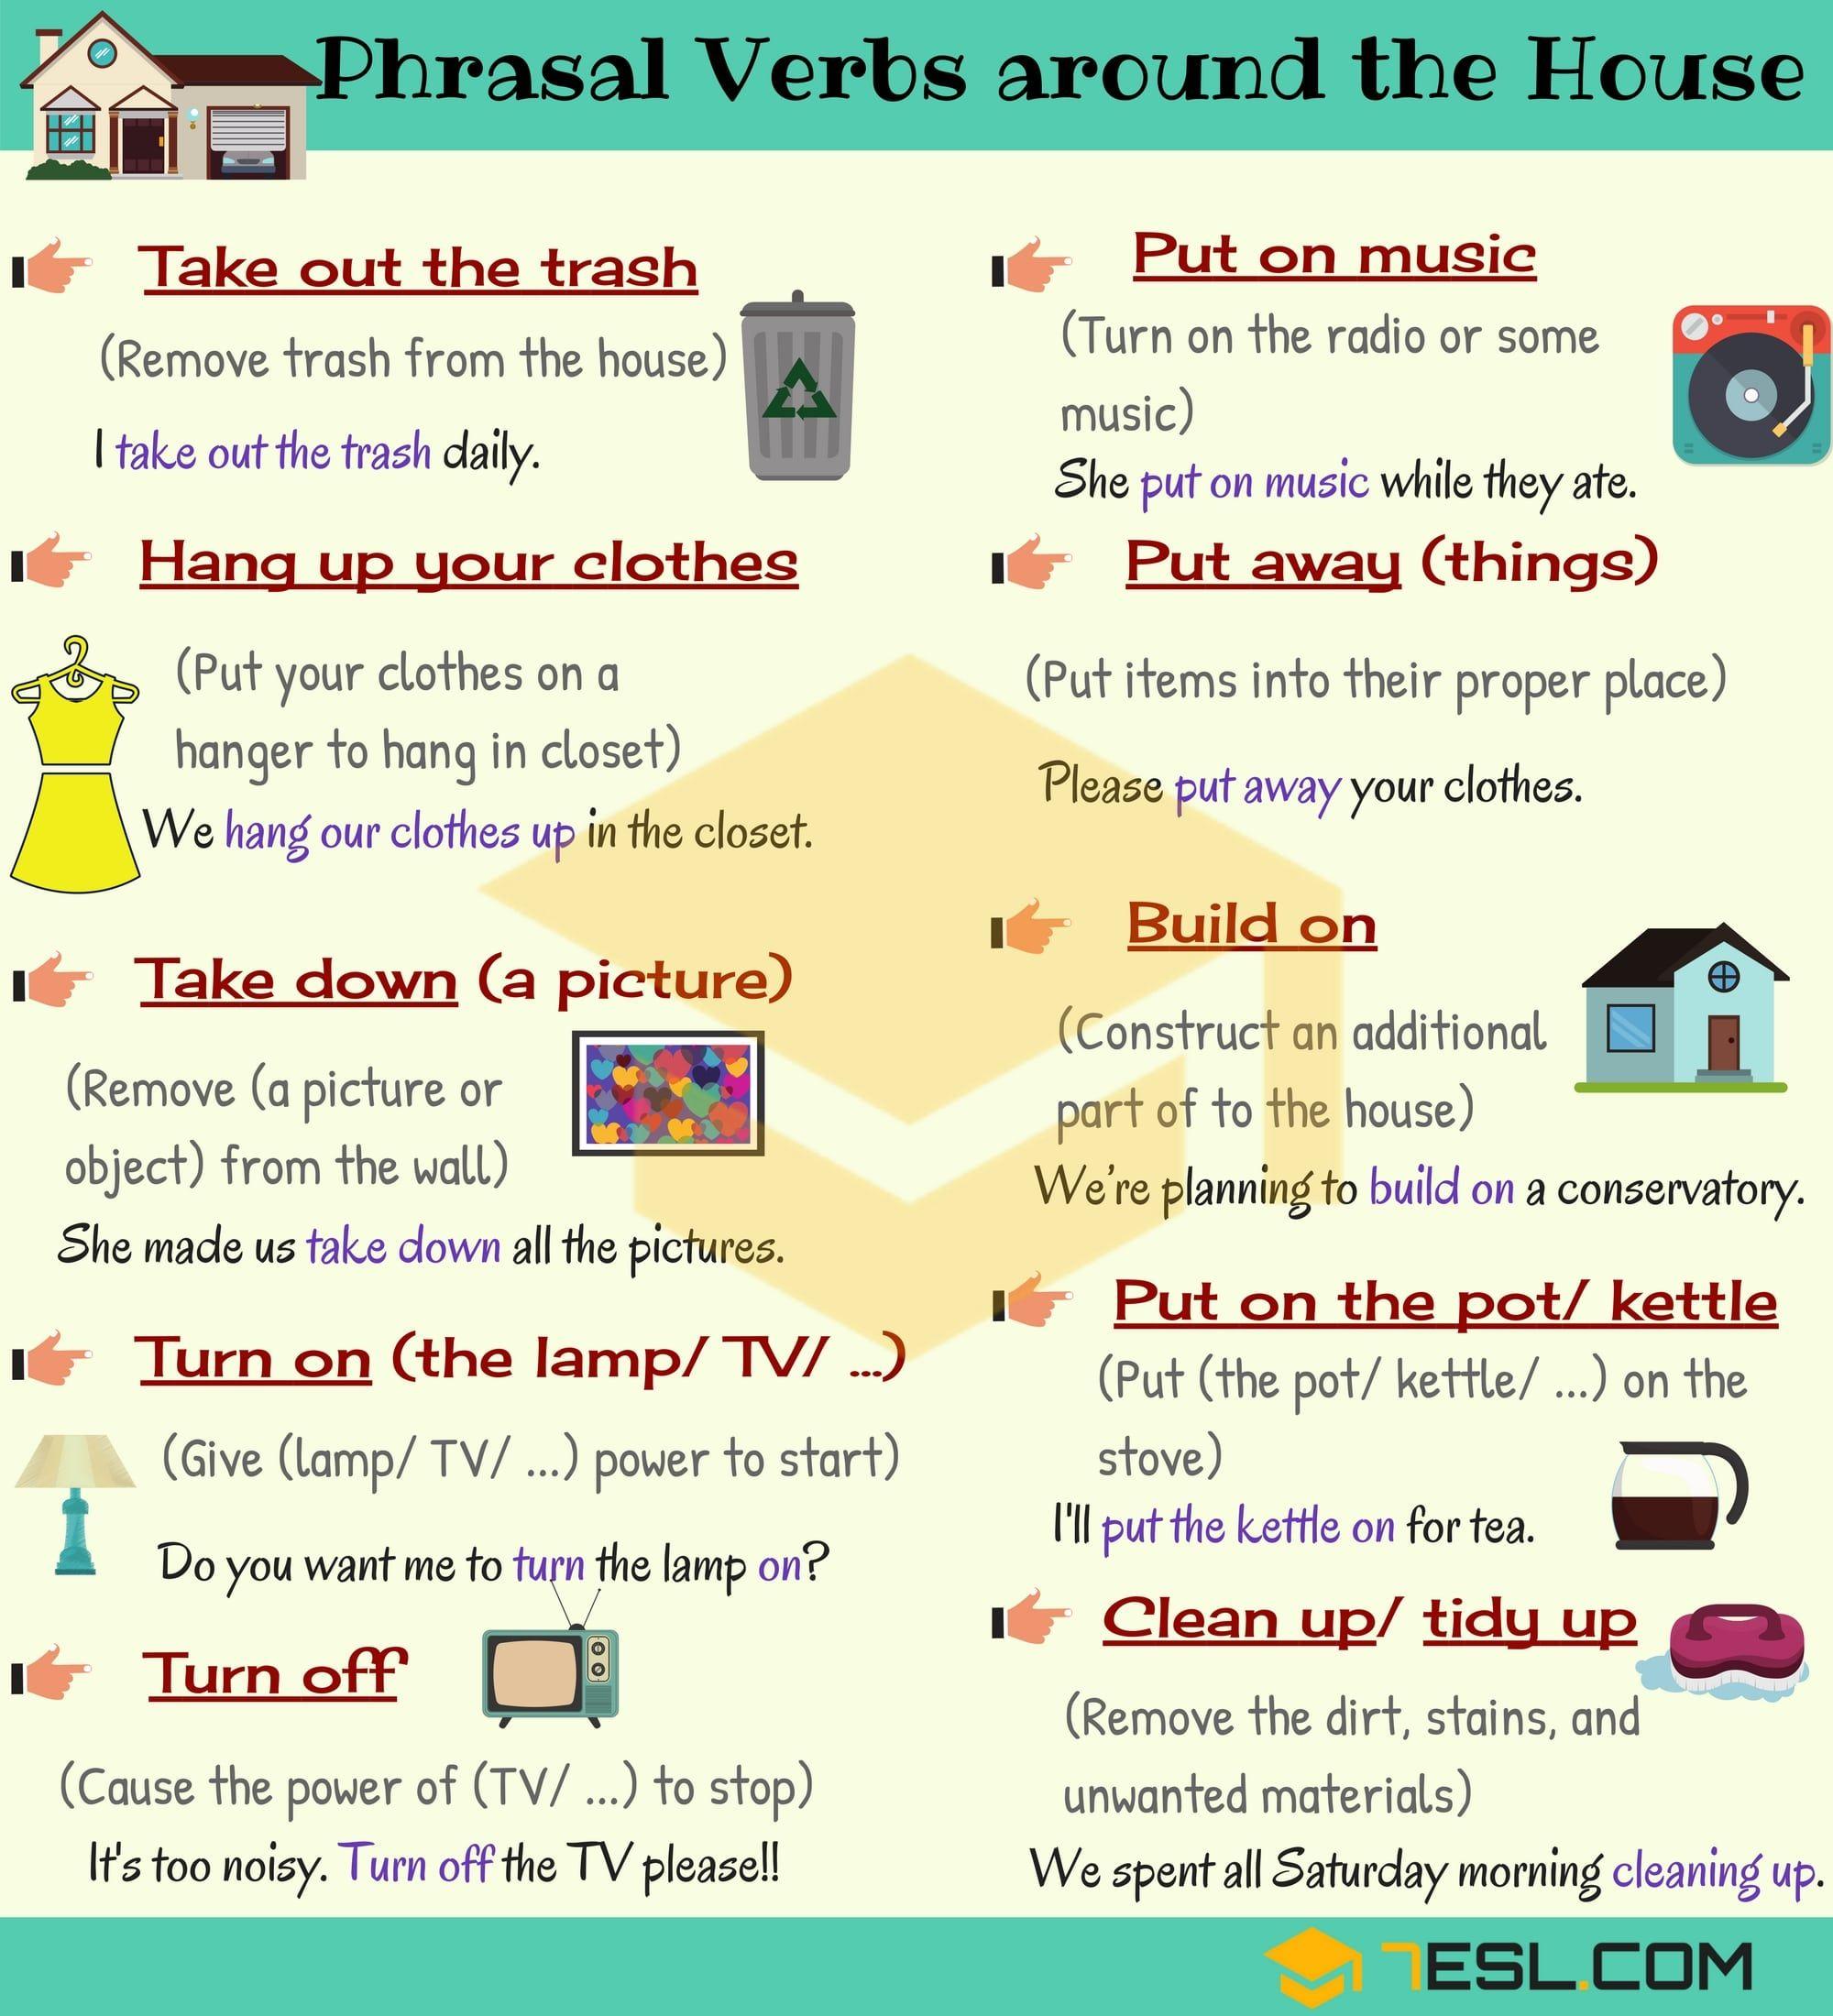 House Phrases 17 Useful Phrasal Verbs Around The House